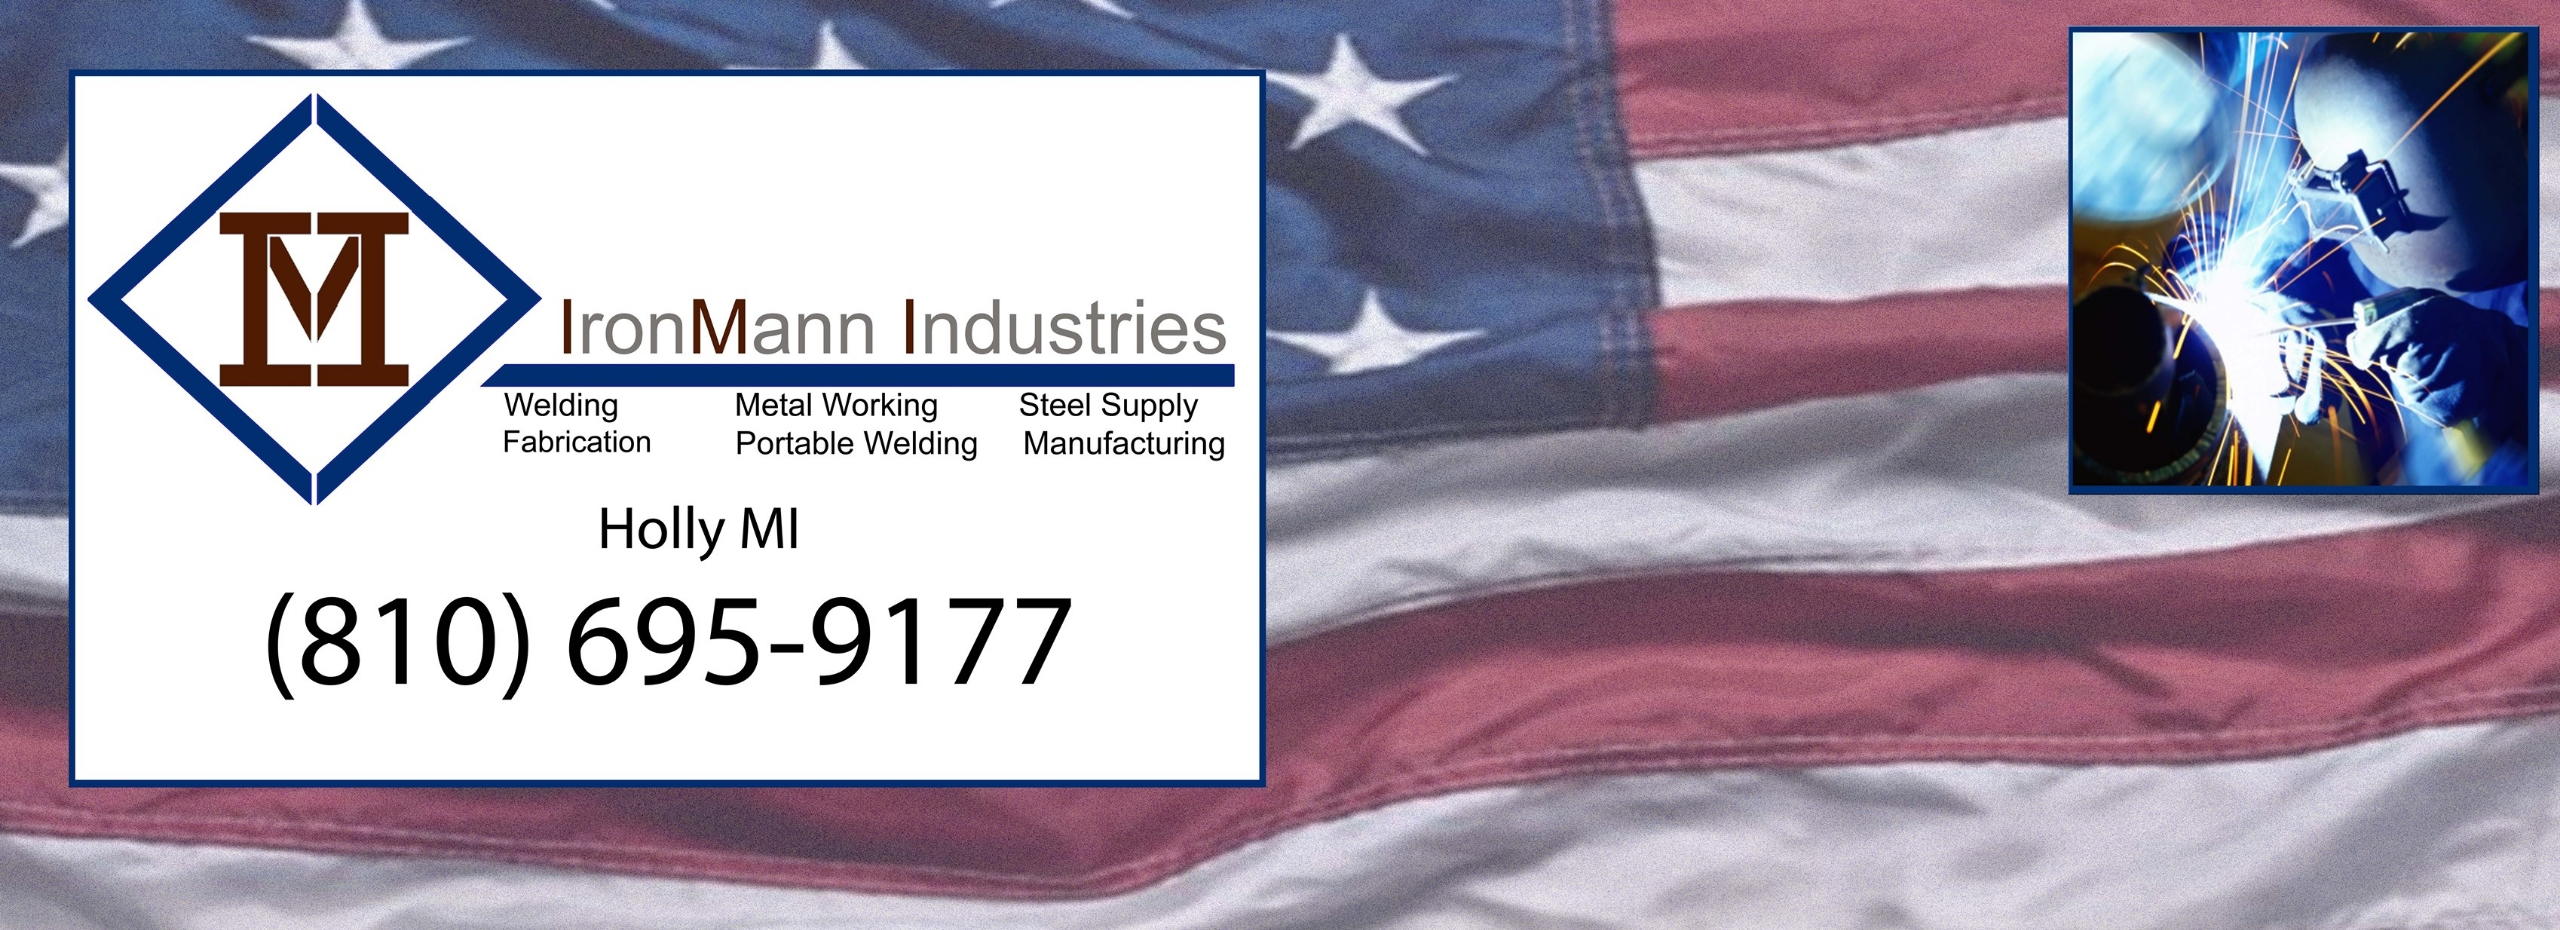 Ironmannindustries -  (@ironmannindustries) Cover Image